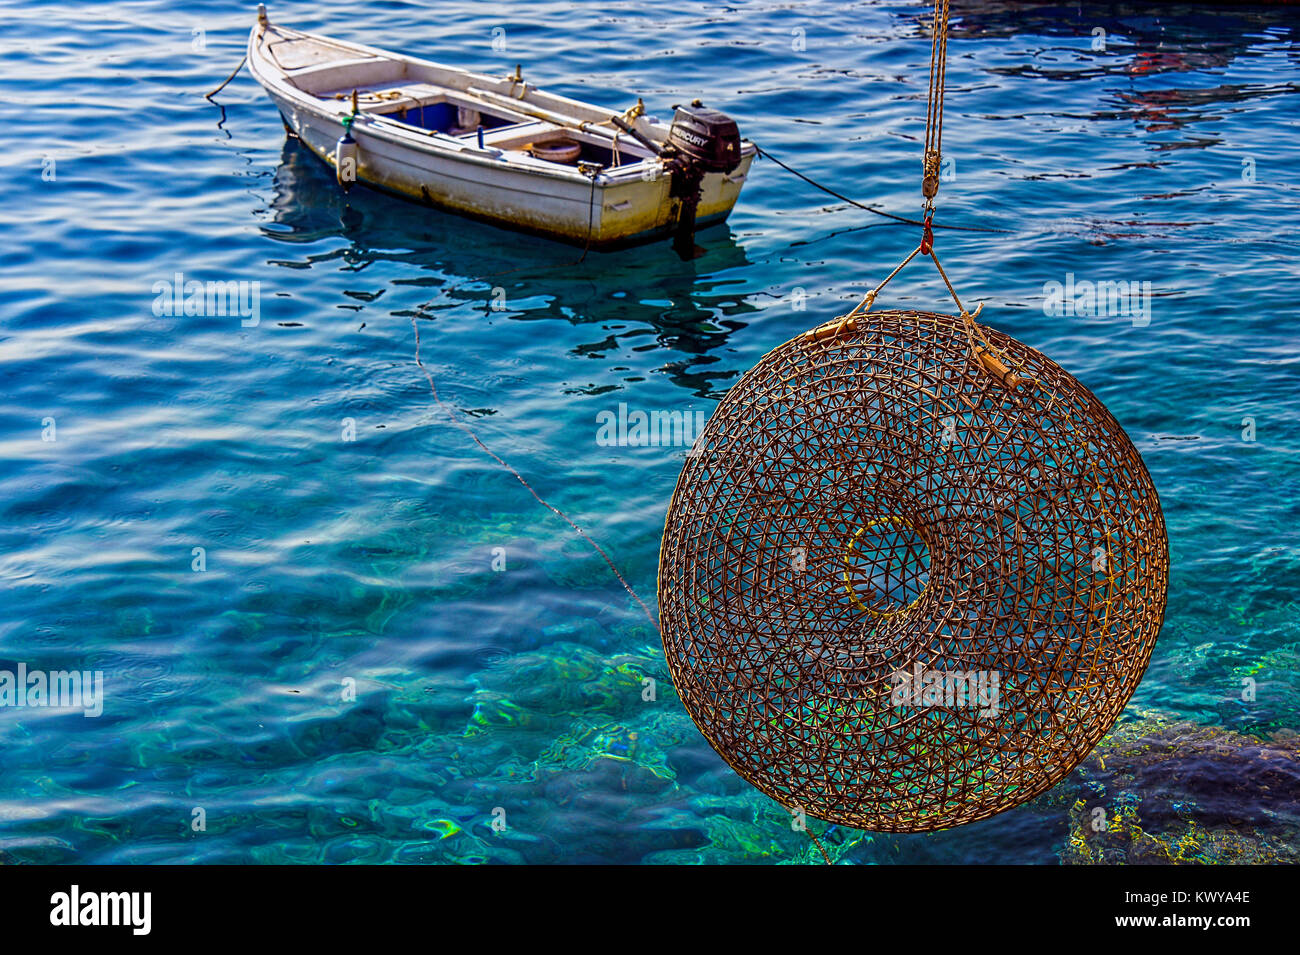 Fishing - Stock Image